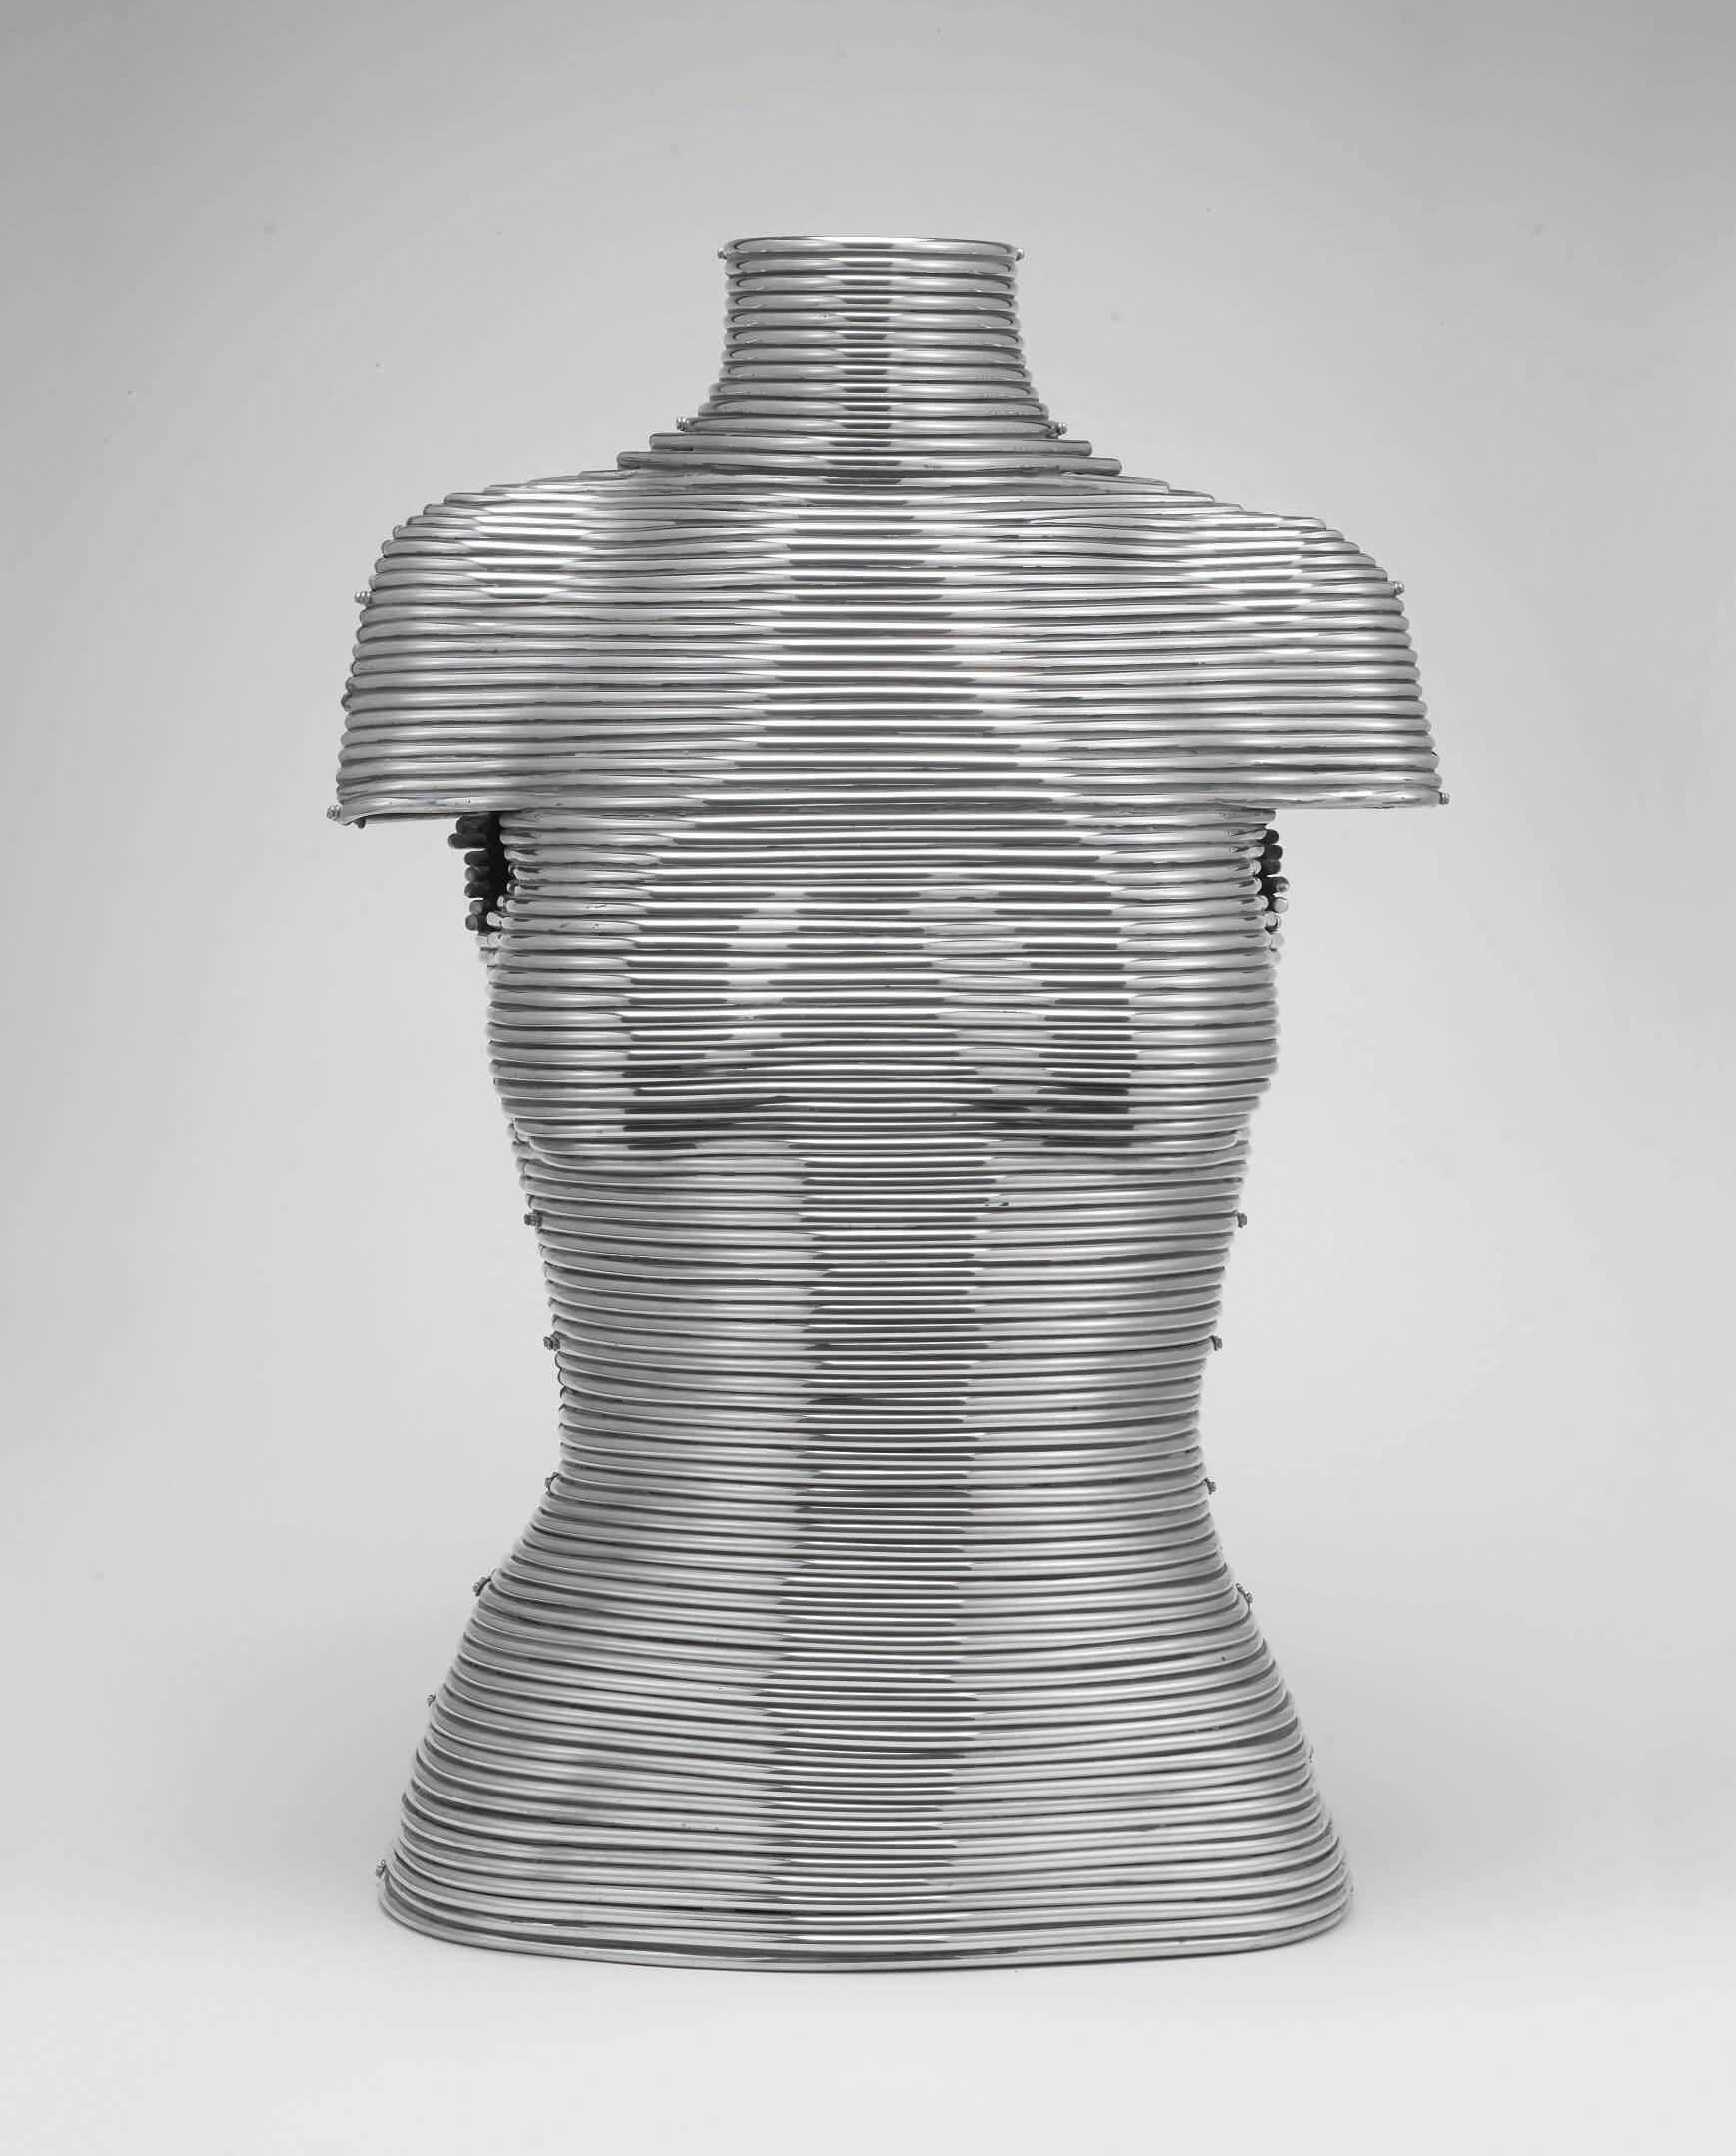 9794 - Coiled Corset.jpg